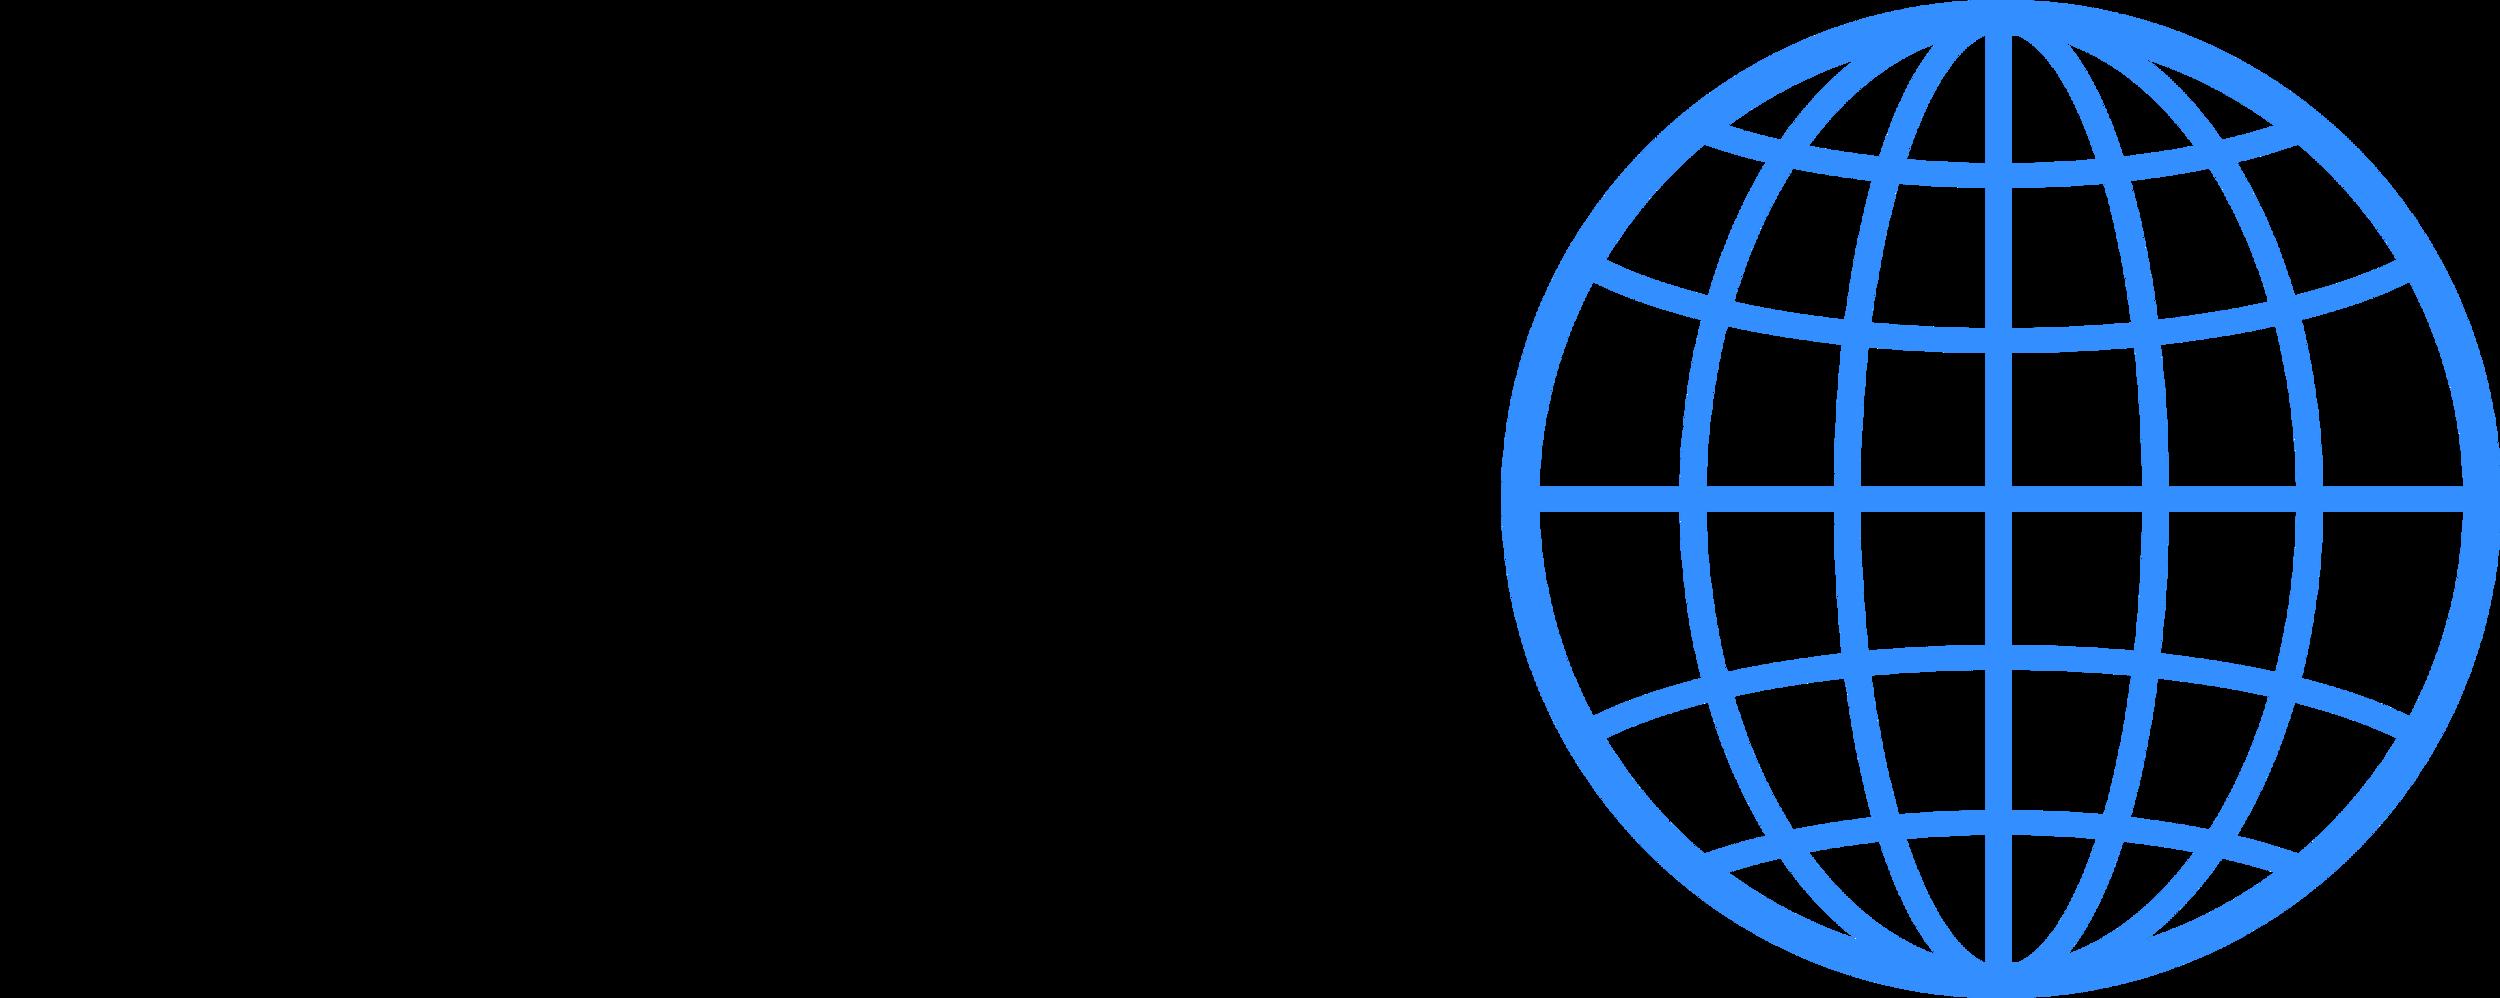 Epiphany Transparent Logo Globe.png